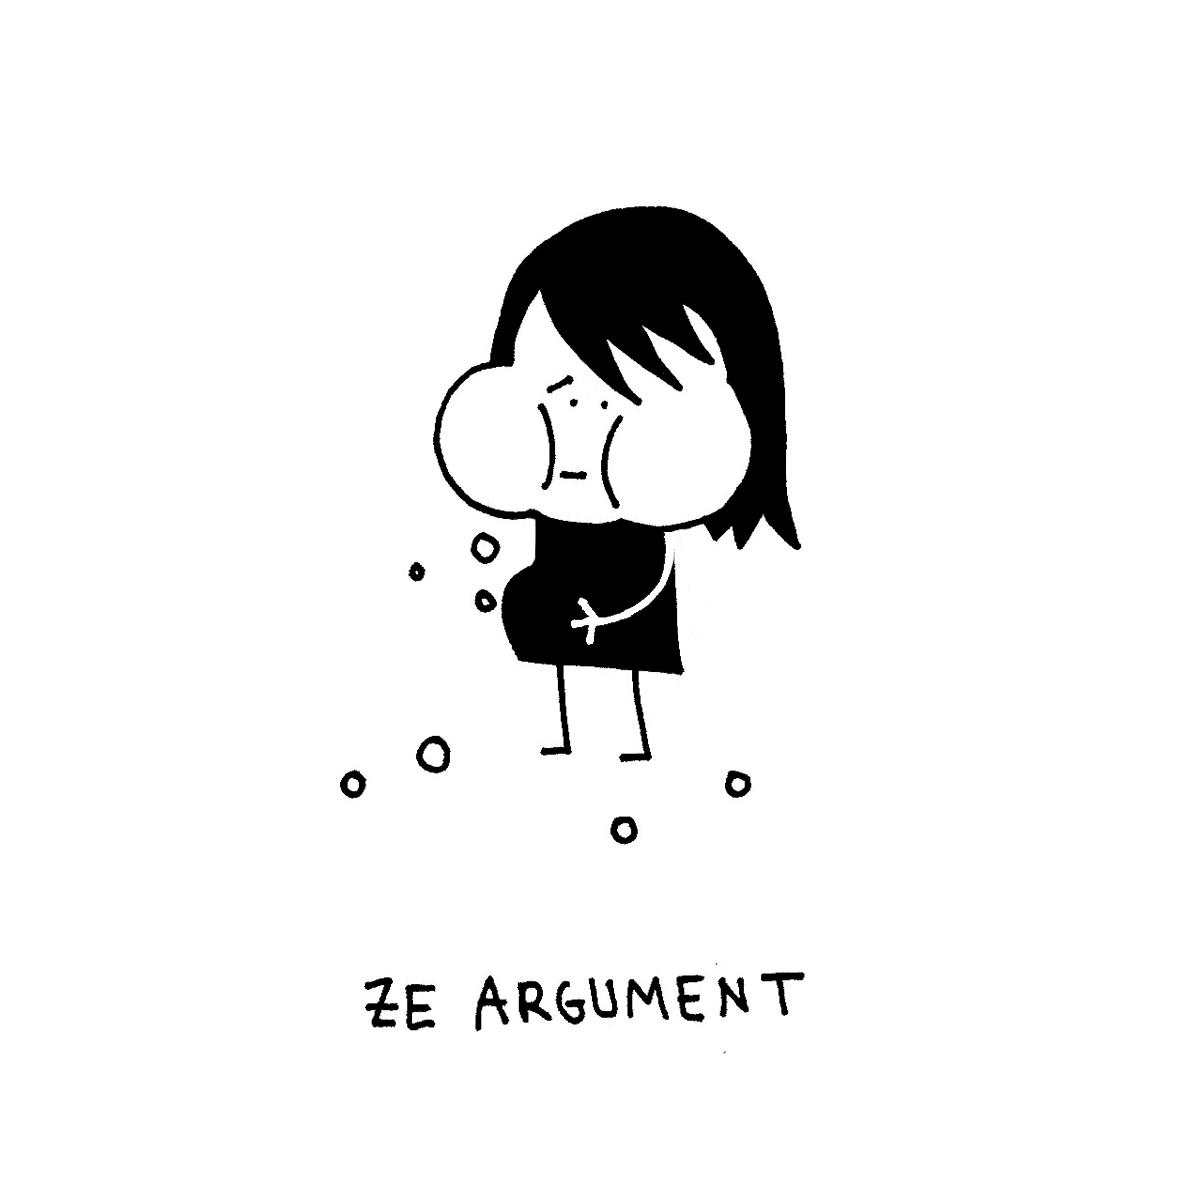 26-ze_argument.jpg